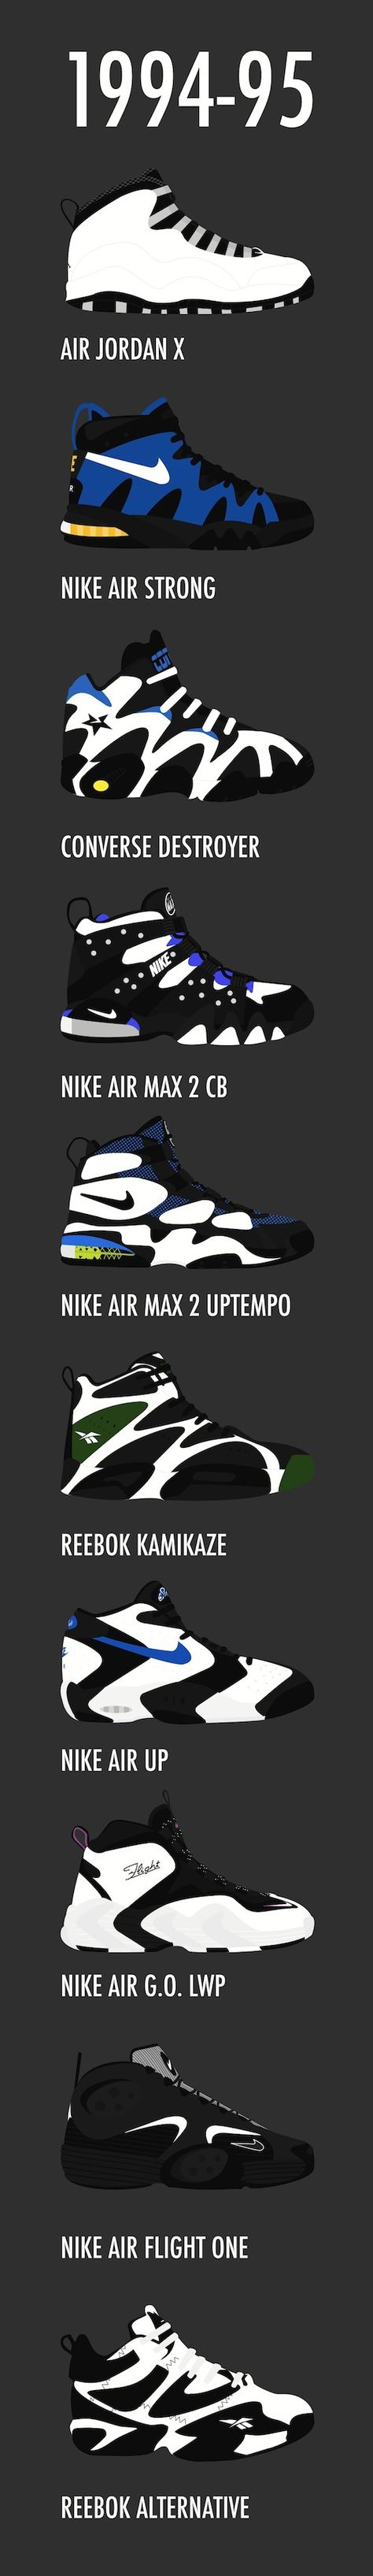 245 Best Air images in 2020 | Sneakers, Nike shoes, Sneakers